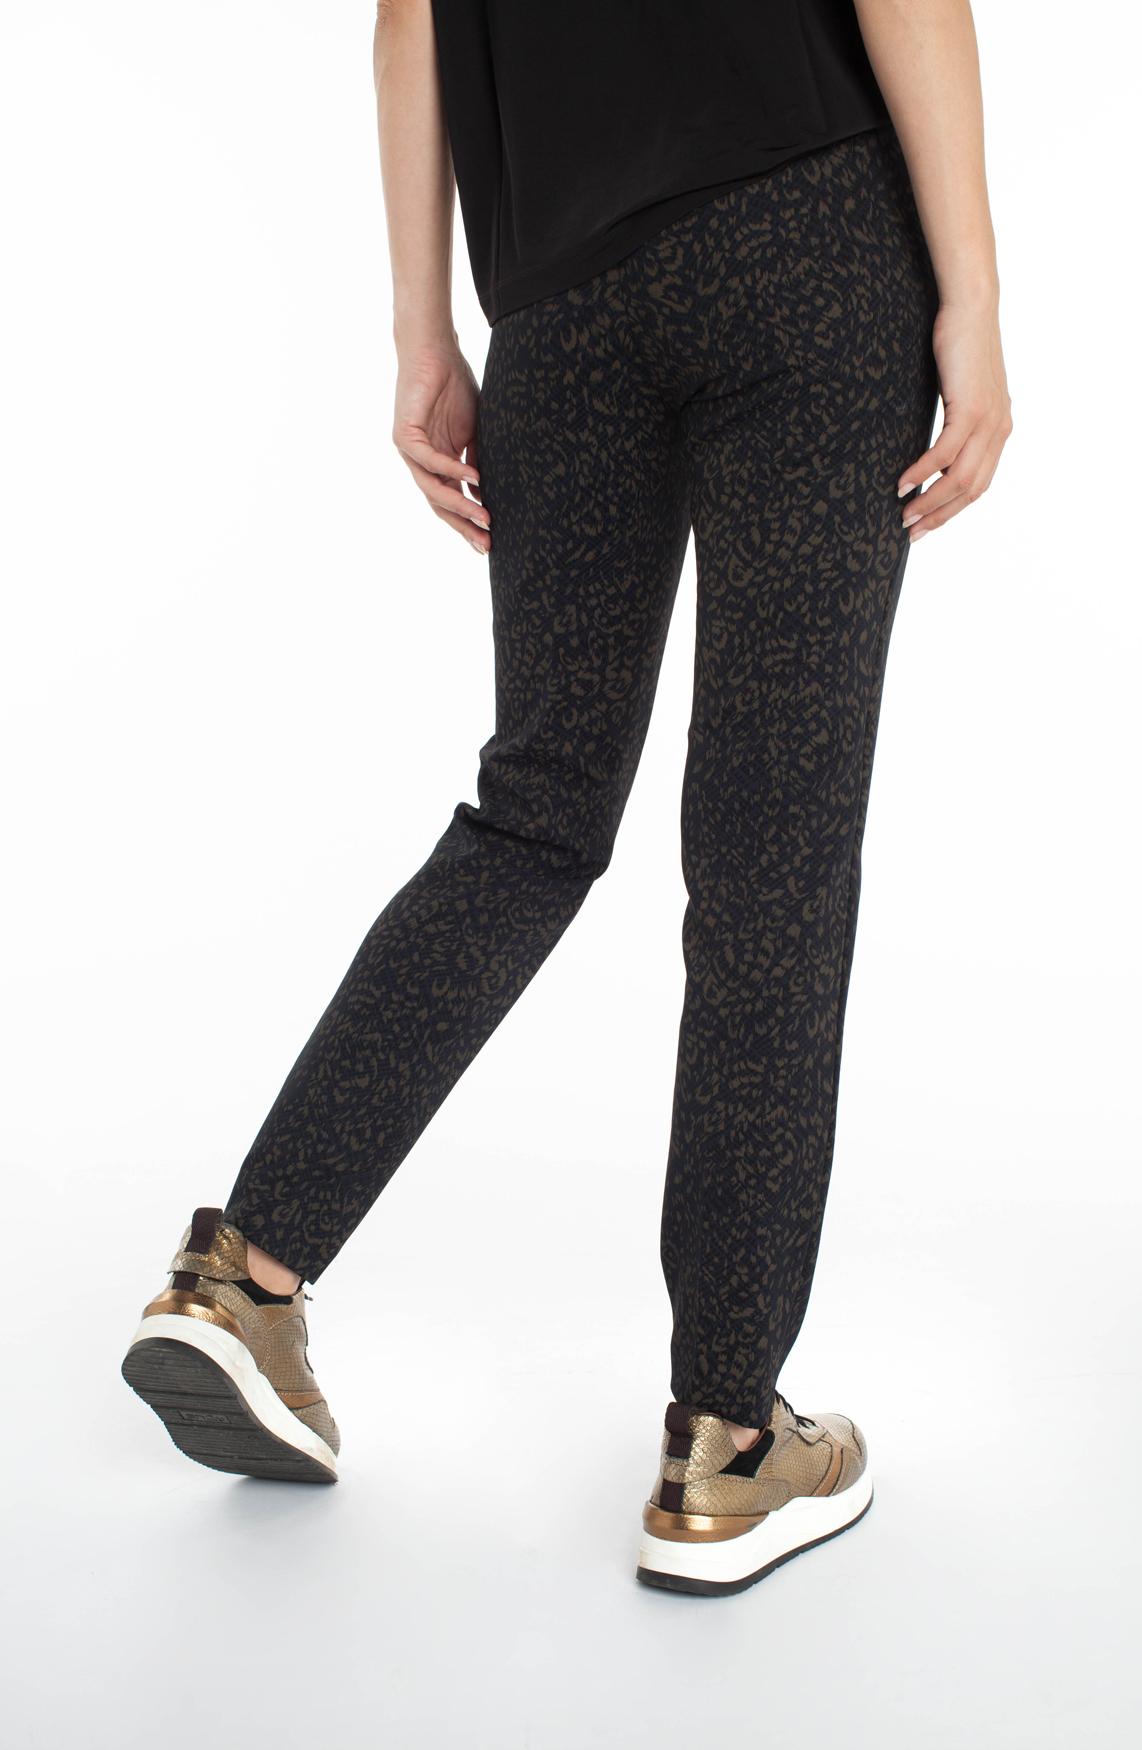 Cambio Dames Ros pantalon met panterprint zwart